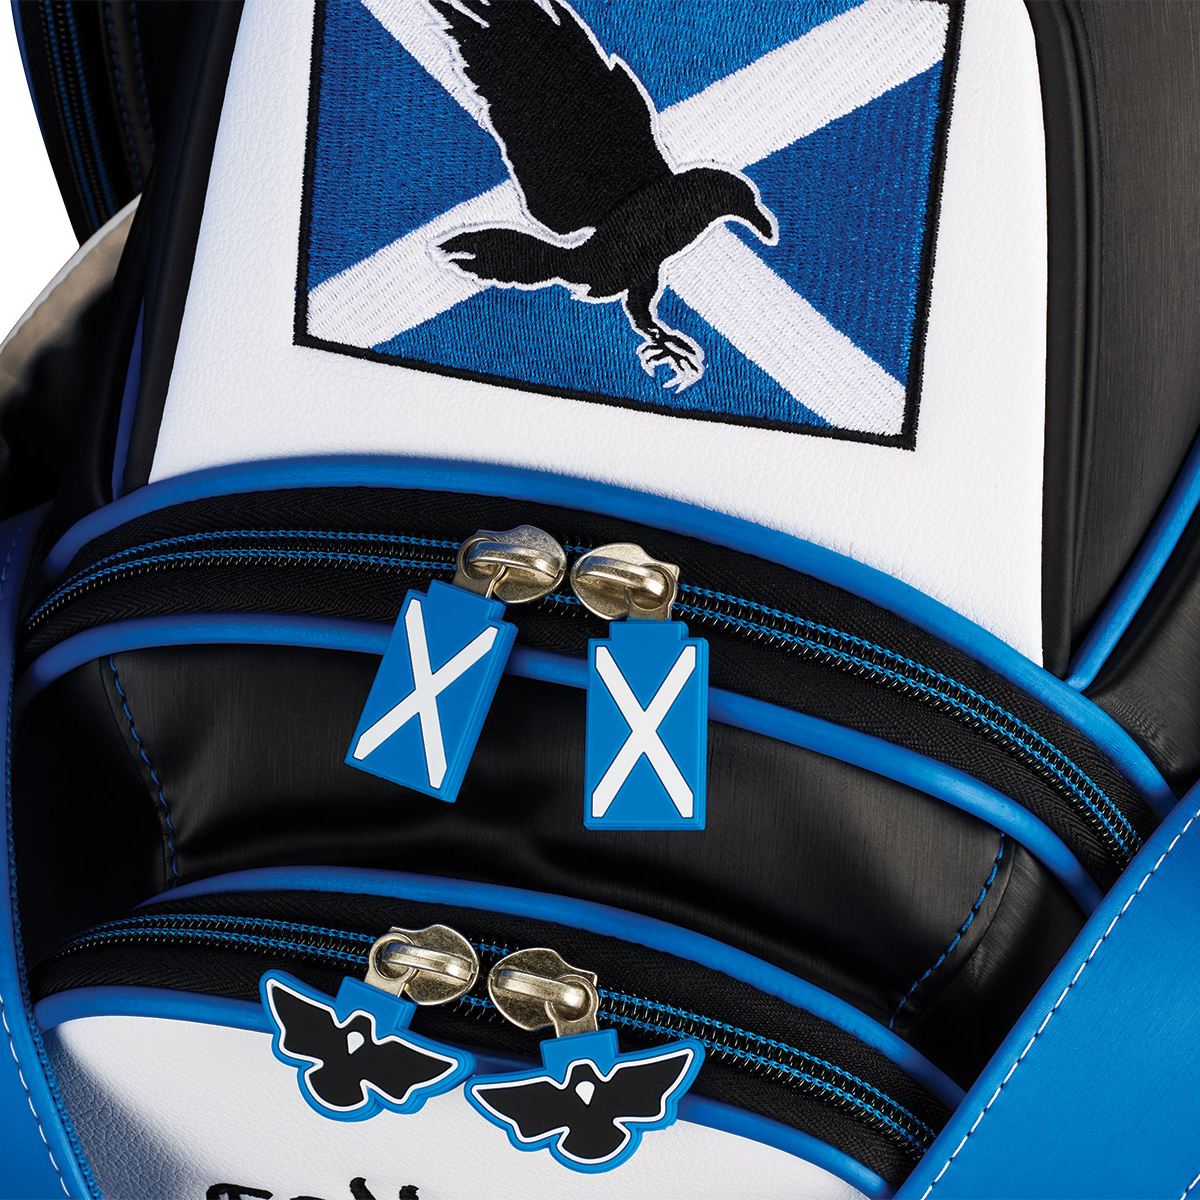 callaway golf british open 2018 staff bag from american golf